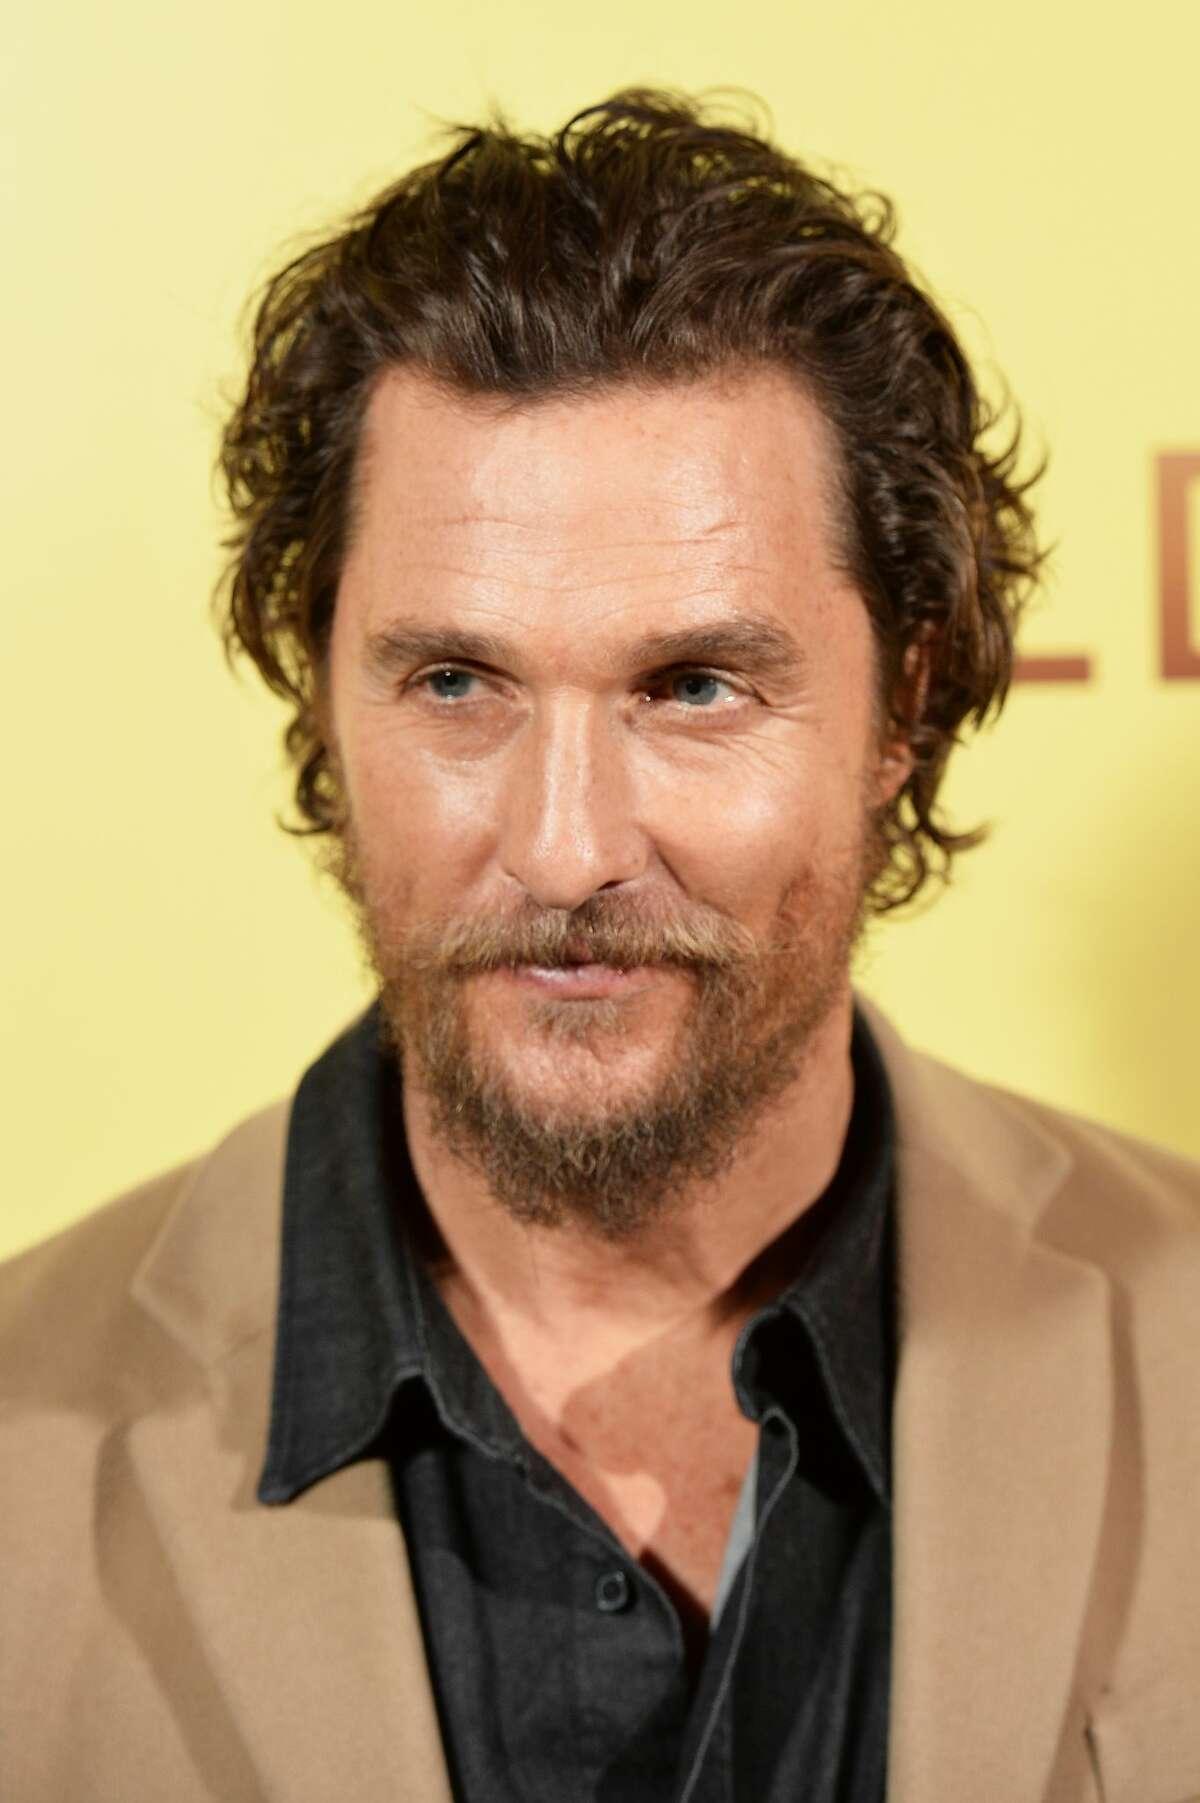 Matthew McConaughey b. 1969 Texas connection: Born in Uvalde, University of Texas grad, lives in Austin Coolness factor: